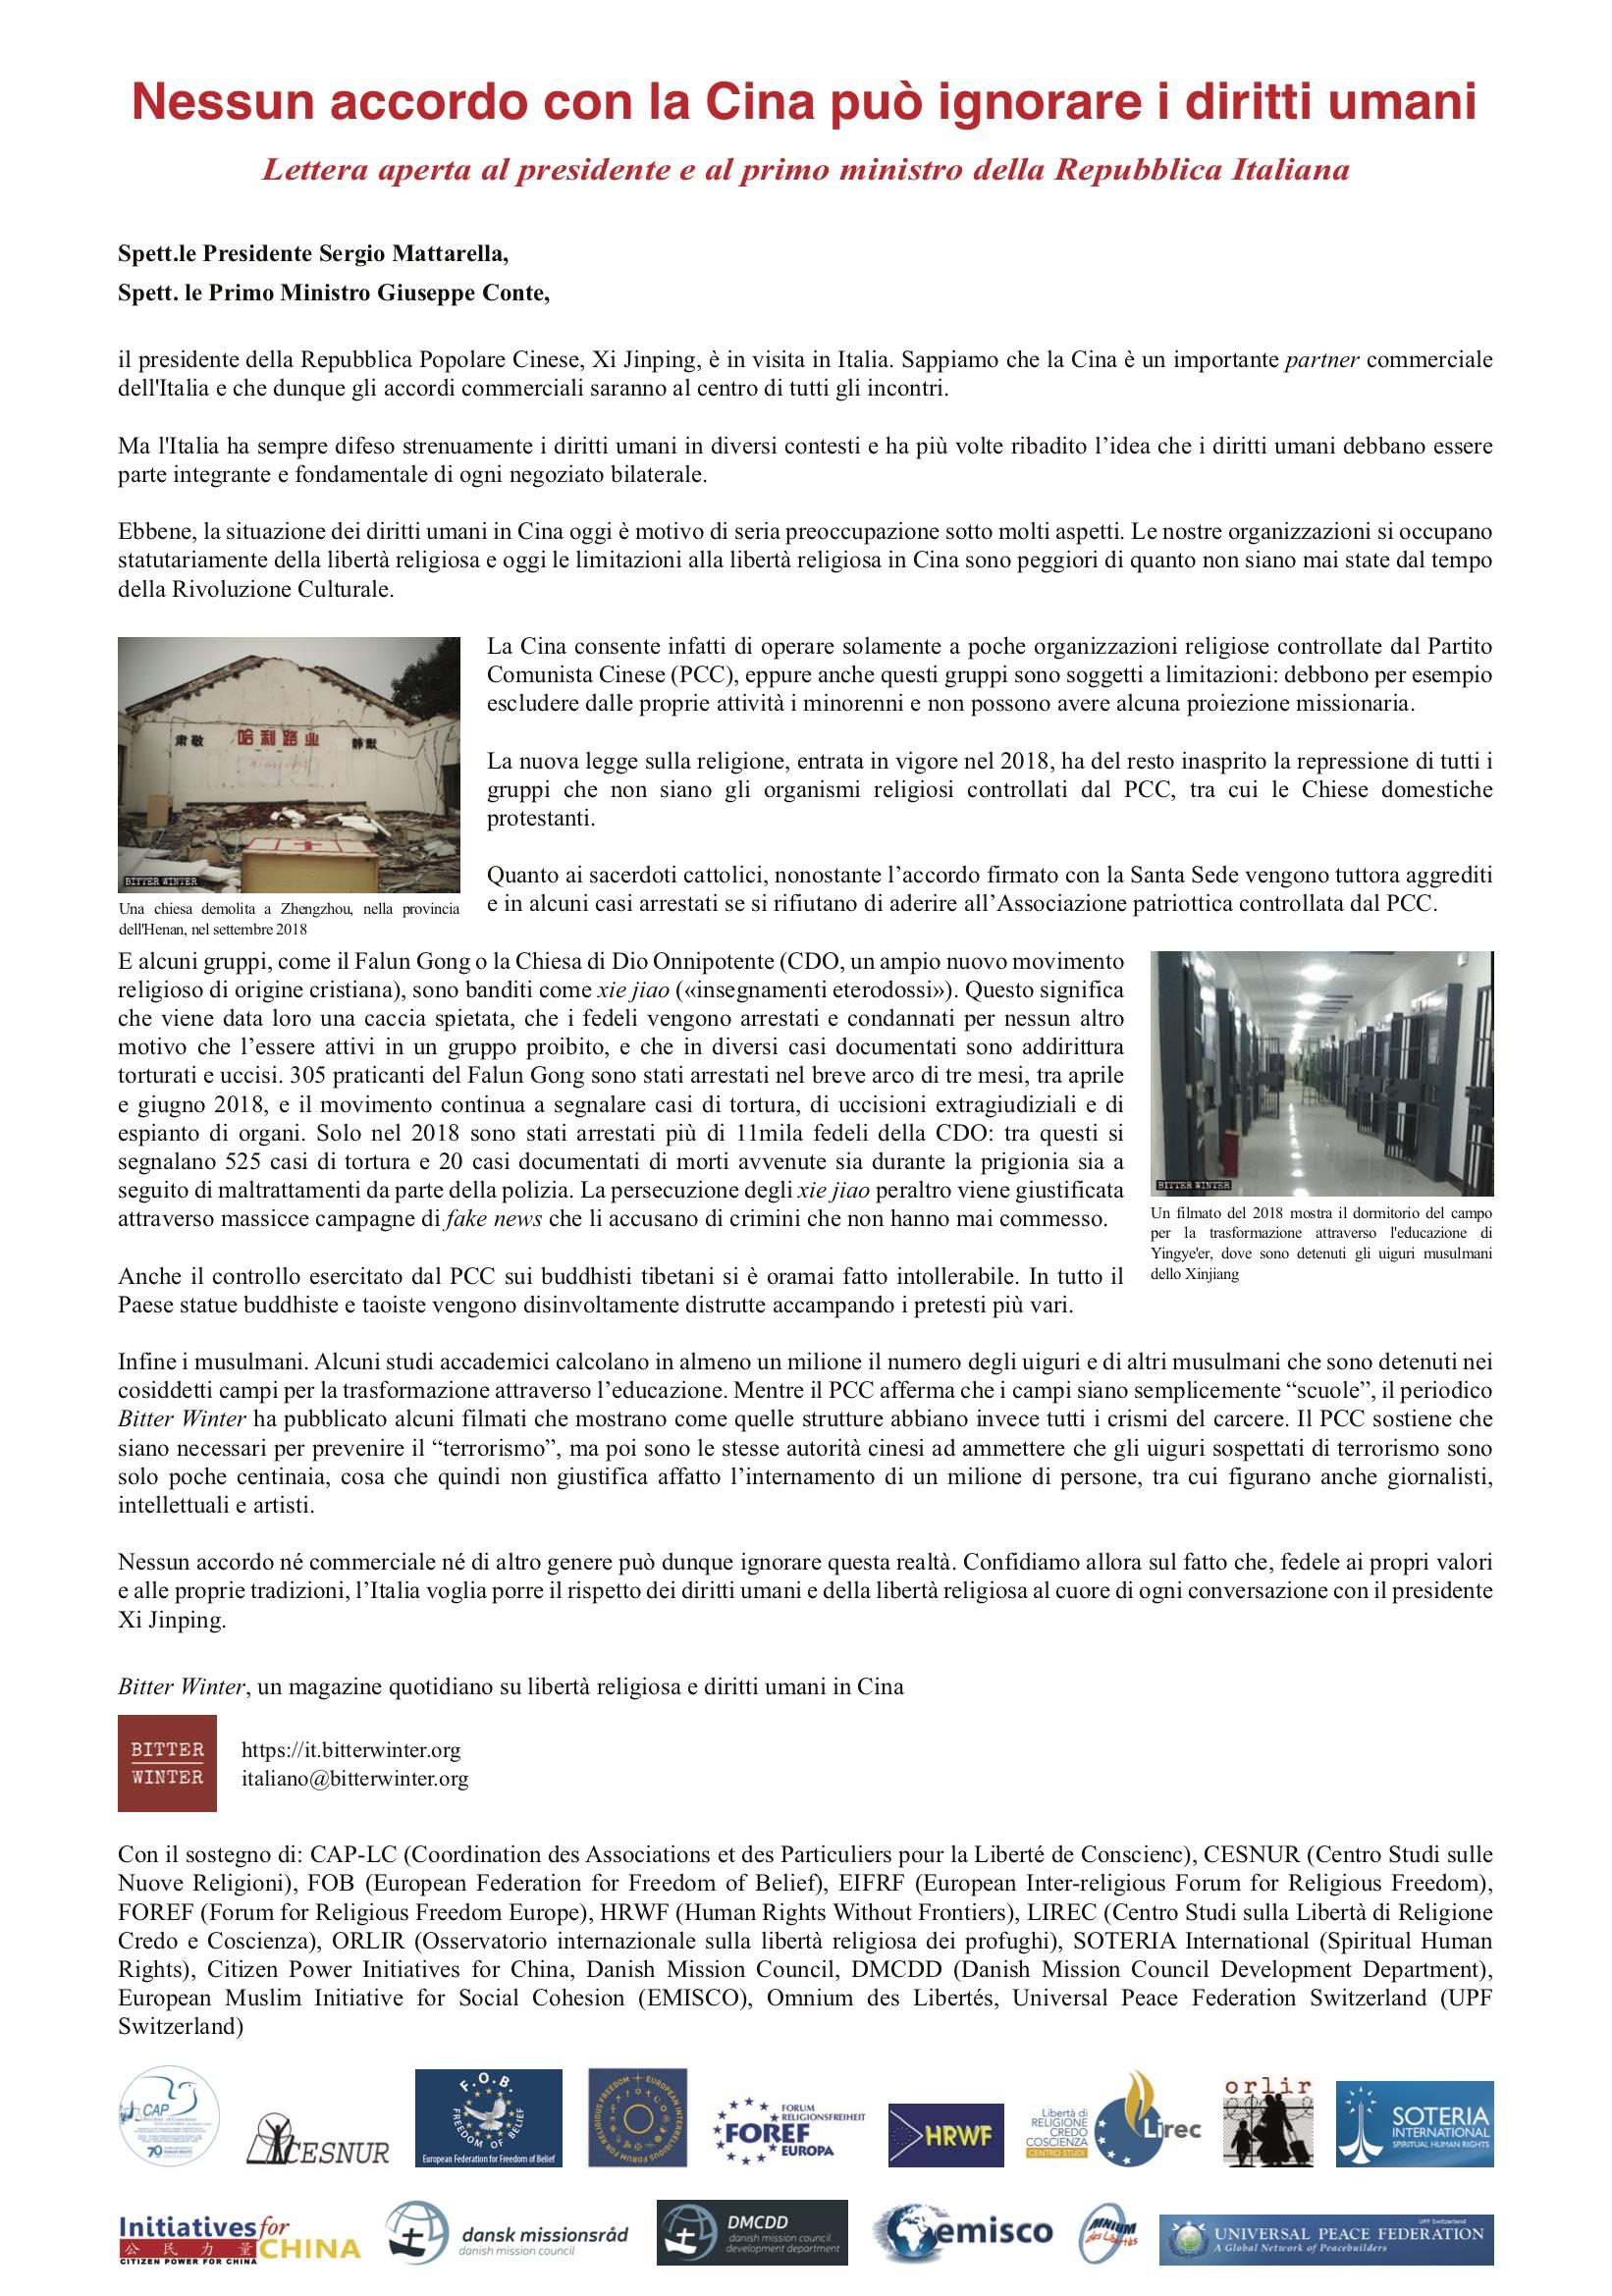 Lettera aperta delle OGN al Presidente cinese Xi Jinping sui diritti umani